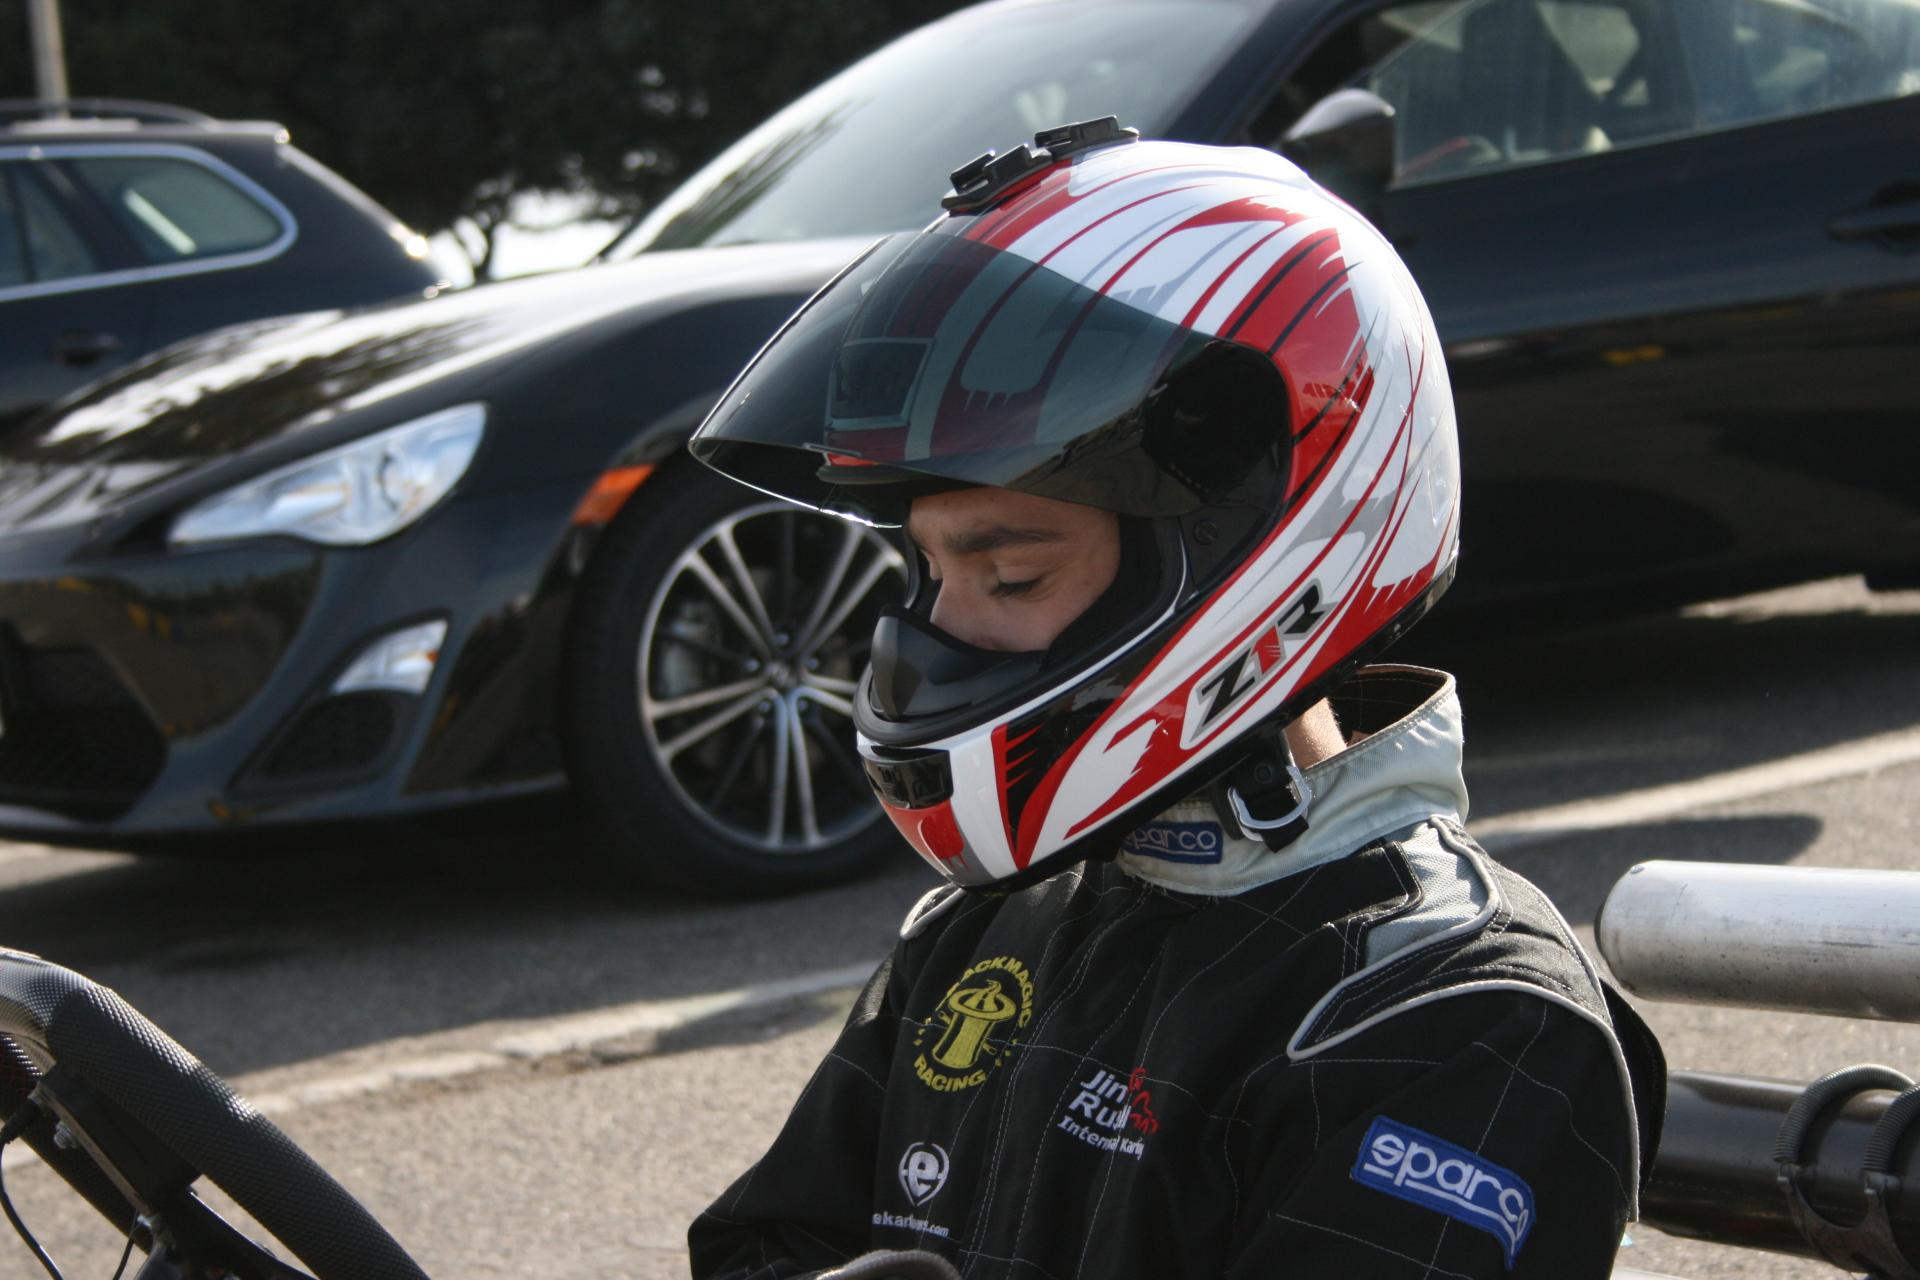 2014 Jim Hall Sprint Kart Championship